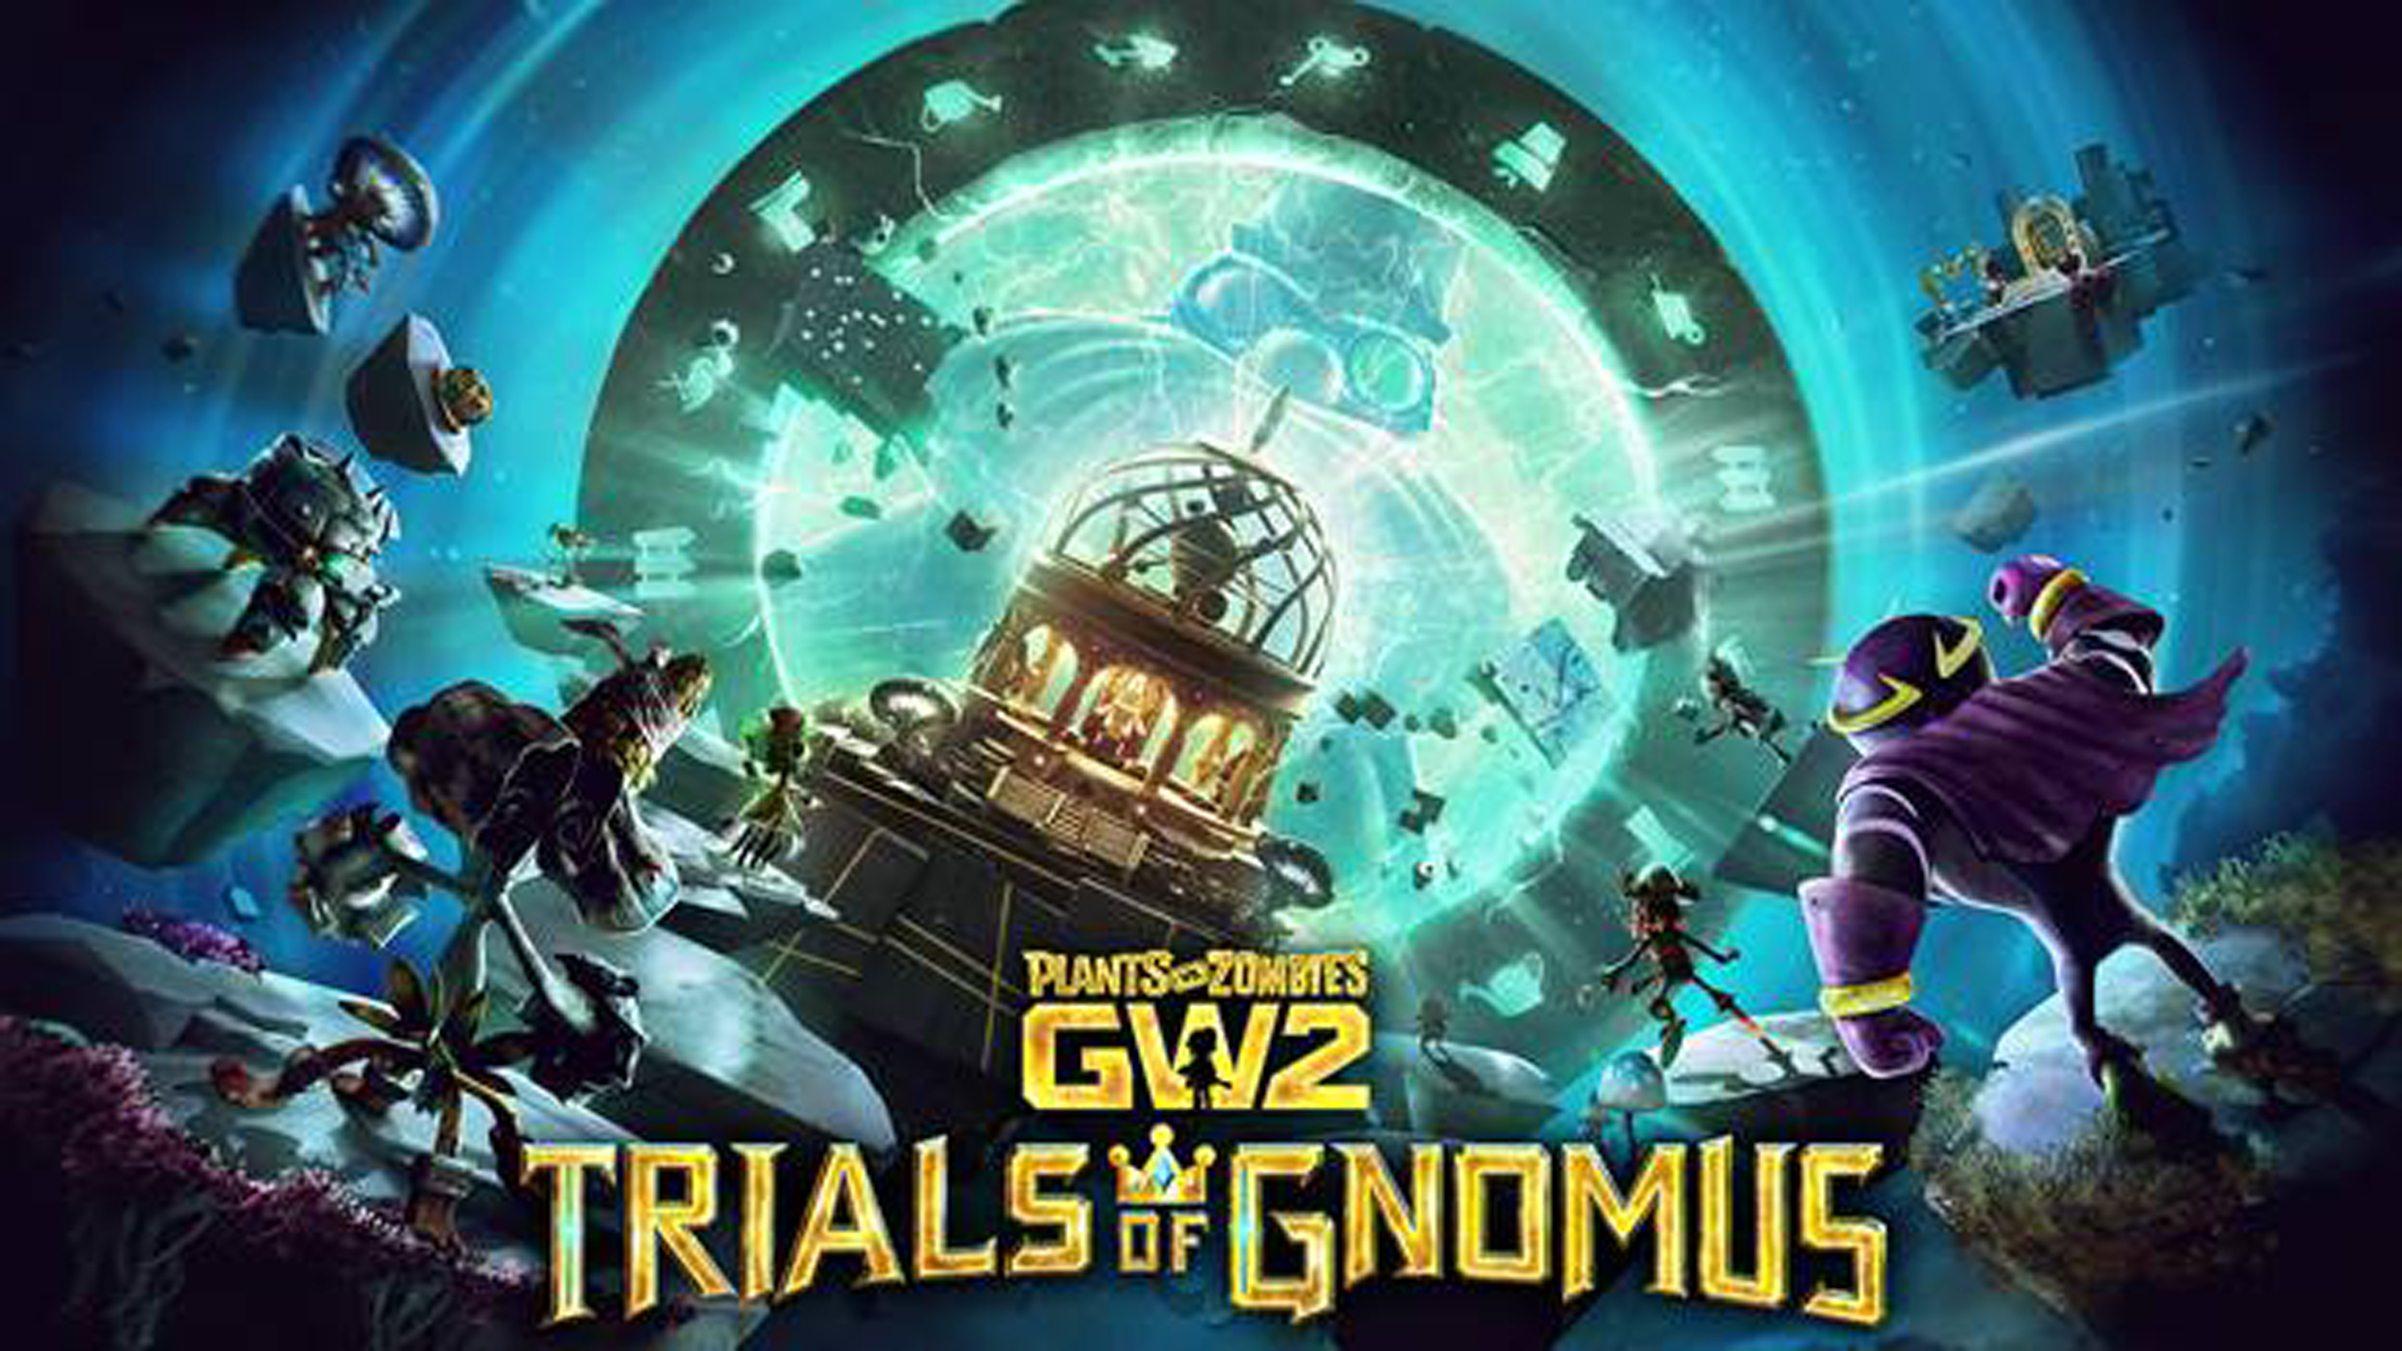 Plants Vs Zombies Garden Warfare 2 Releases 4th Massive Content Update Trials Of Gnomus